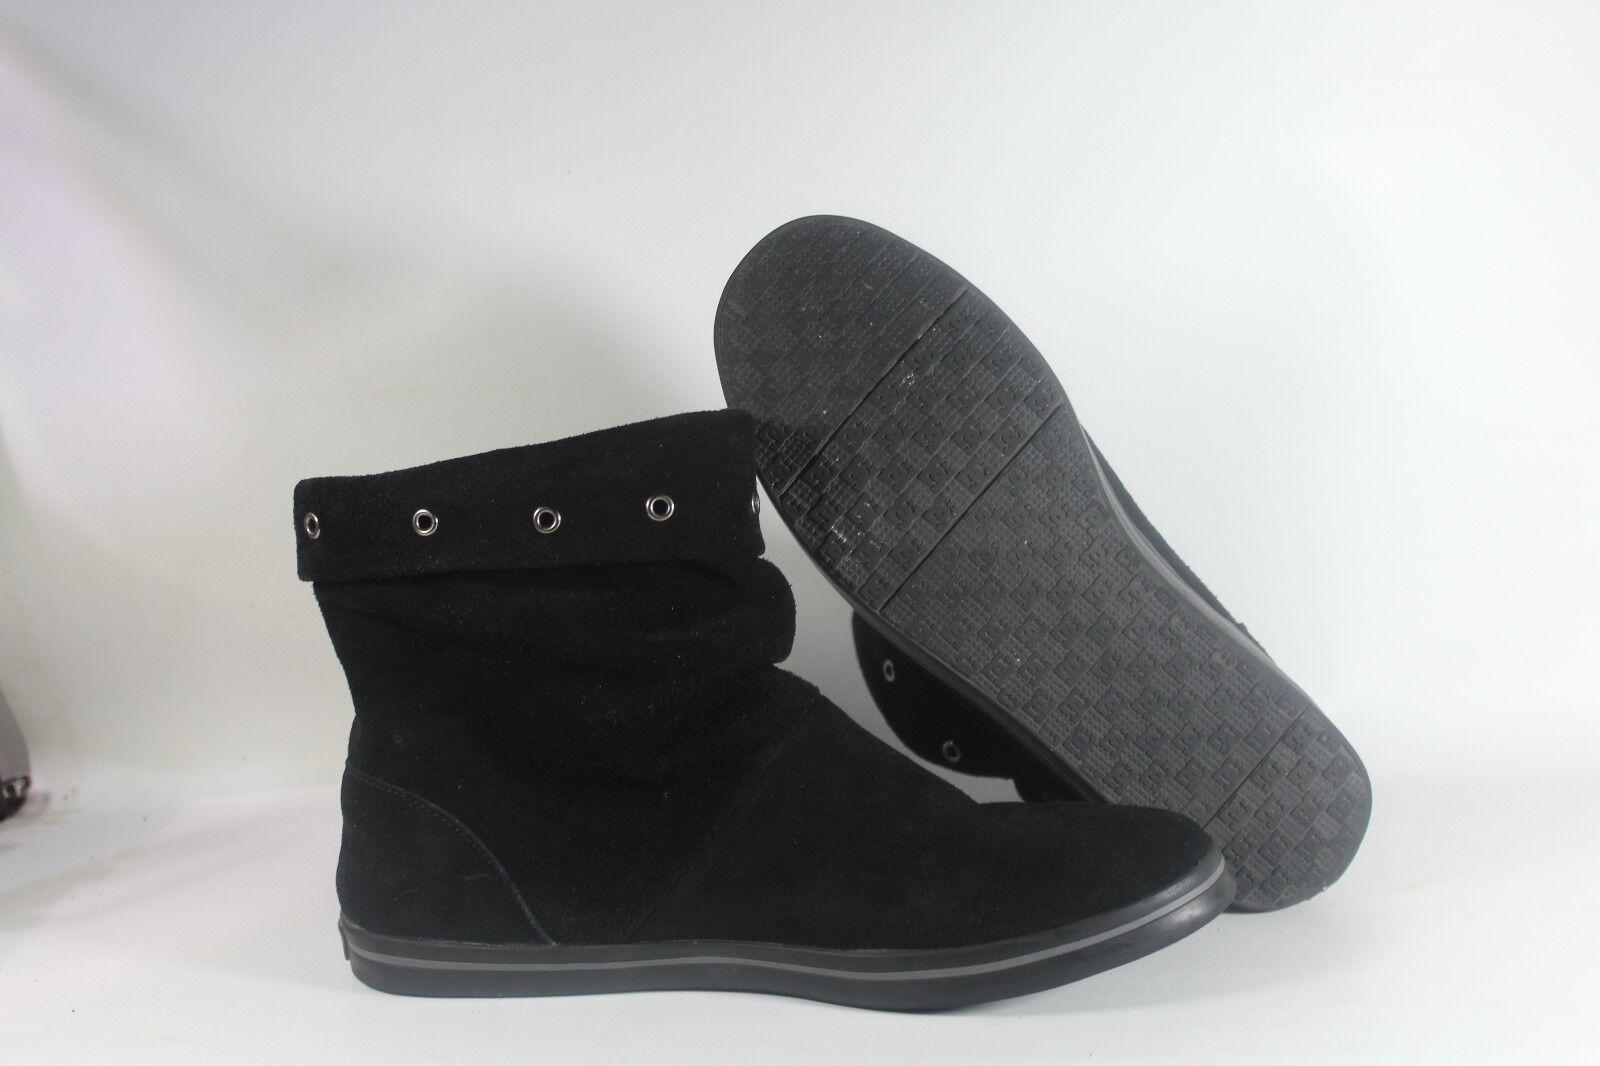 Aura 303225-negro Dc para mujer (Negro) Tamaño EE. UU. 9W DC zapatos